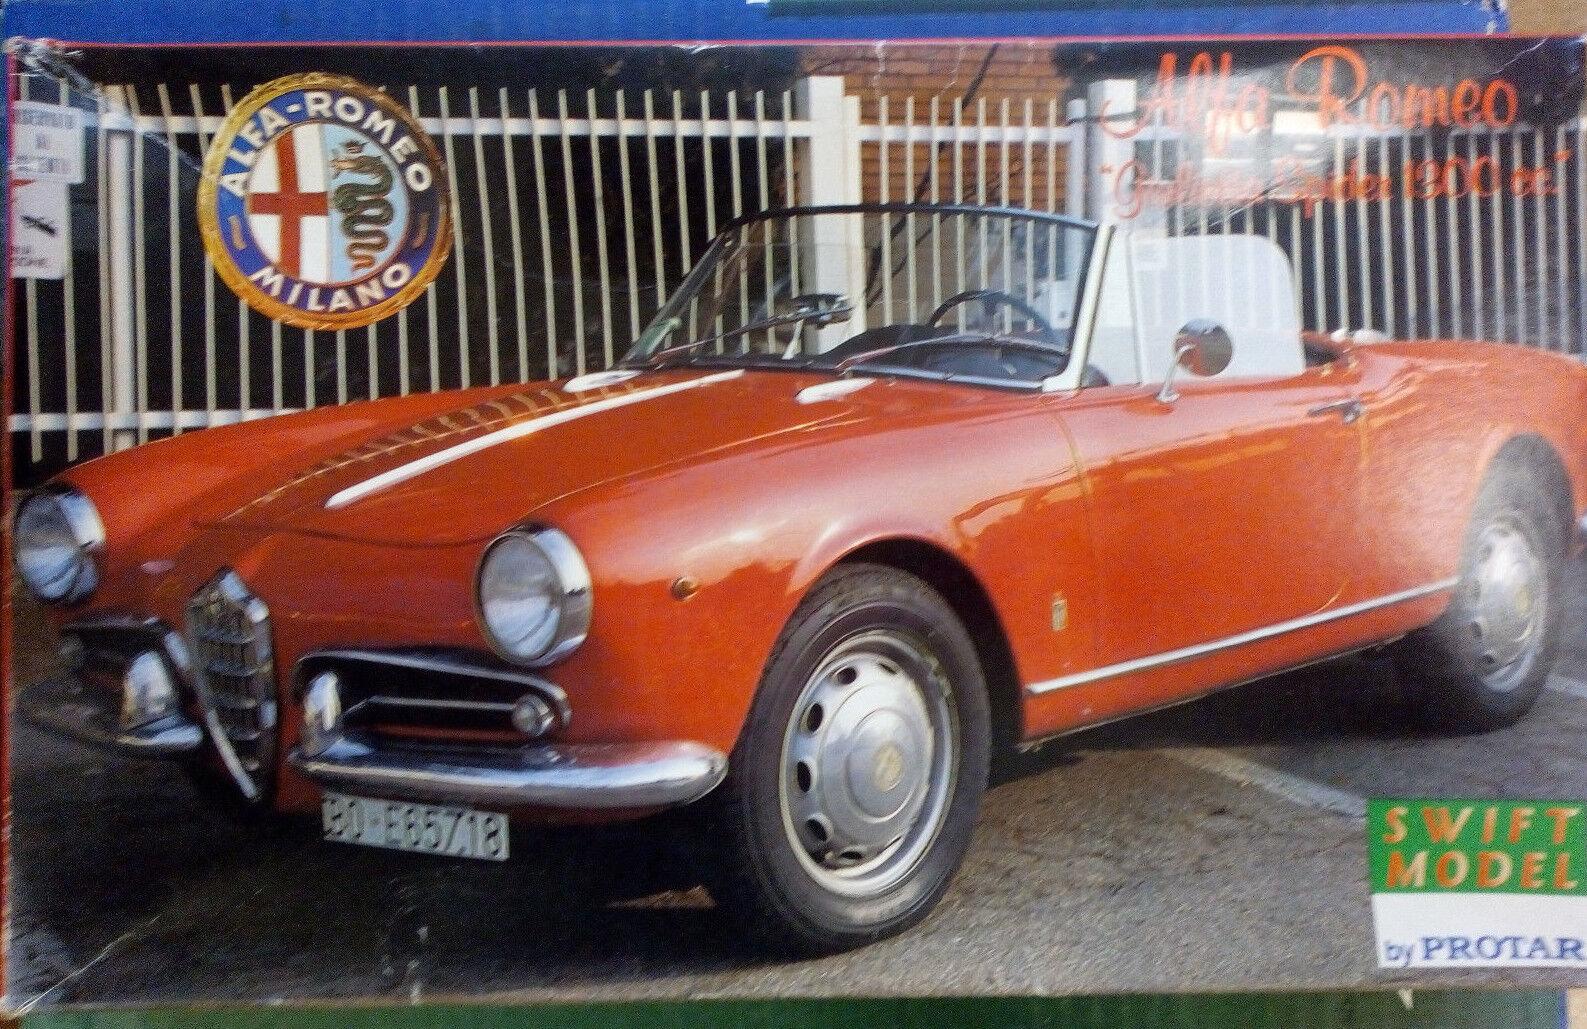 ALFA ROMEO GUILETTA SPIDER 1 24, old ProugeAR vintage neuf dans sa boîte new model kit, Comme neuf